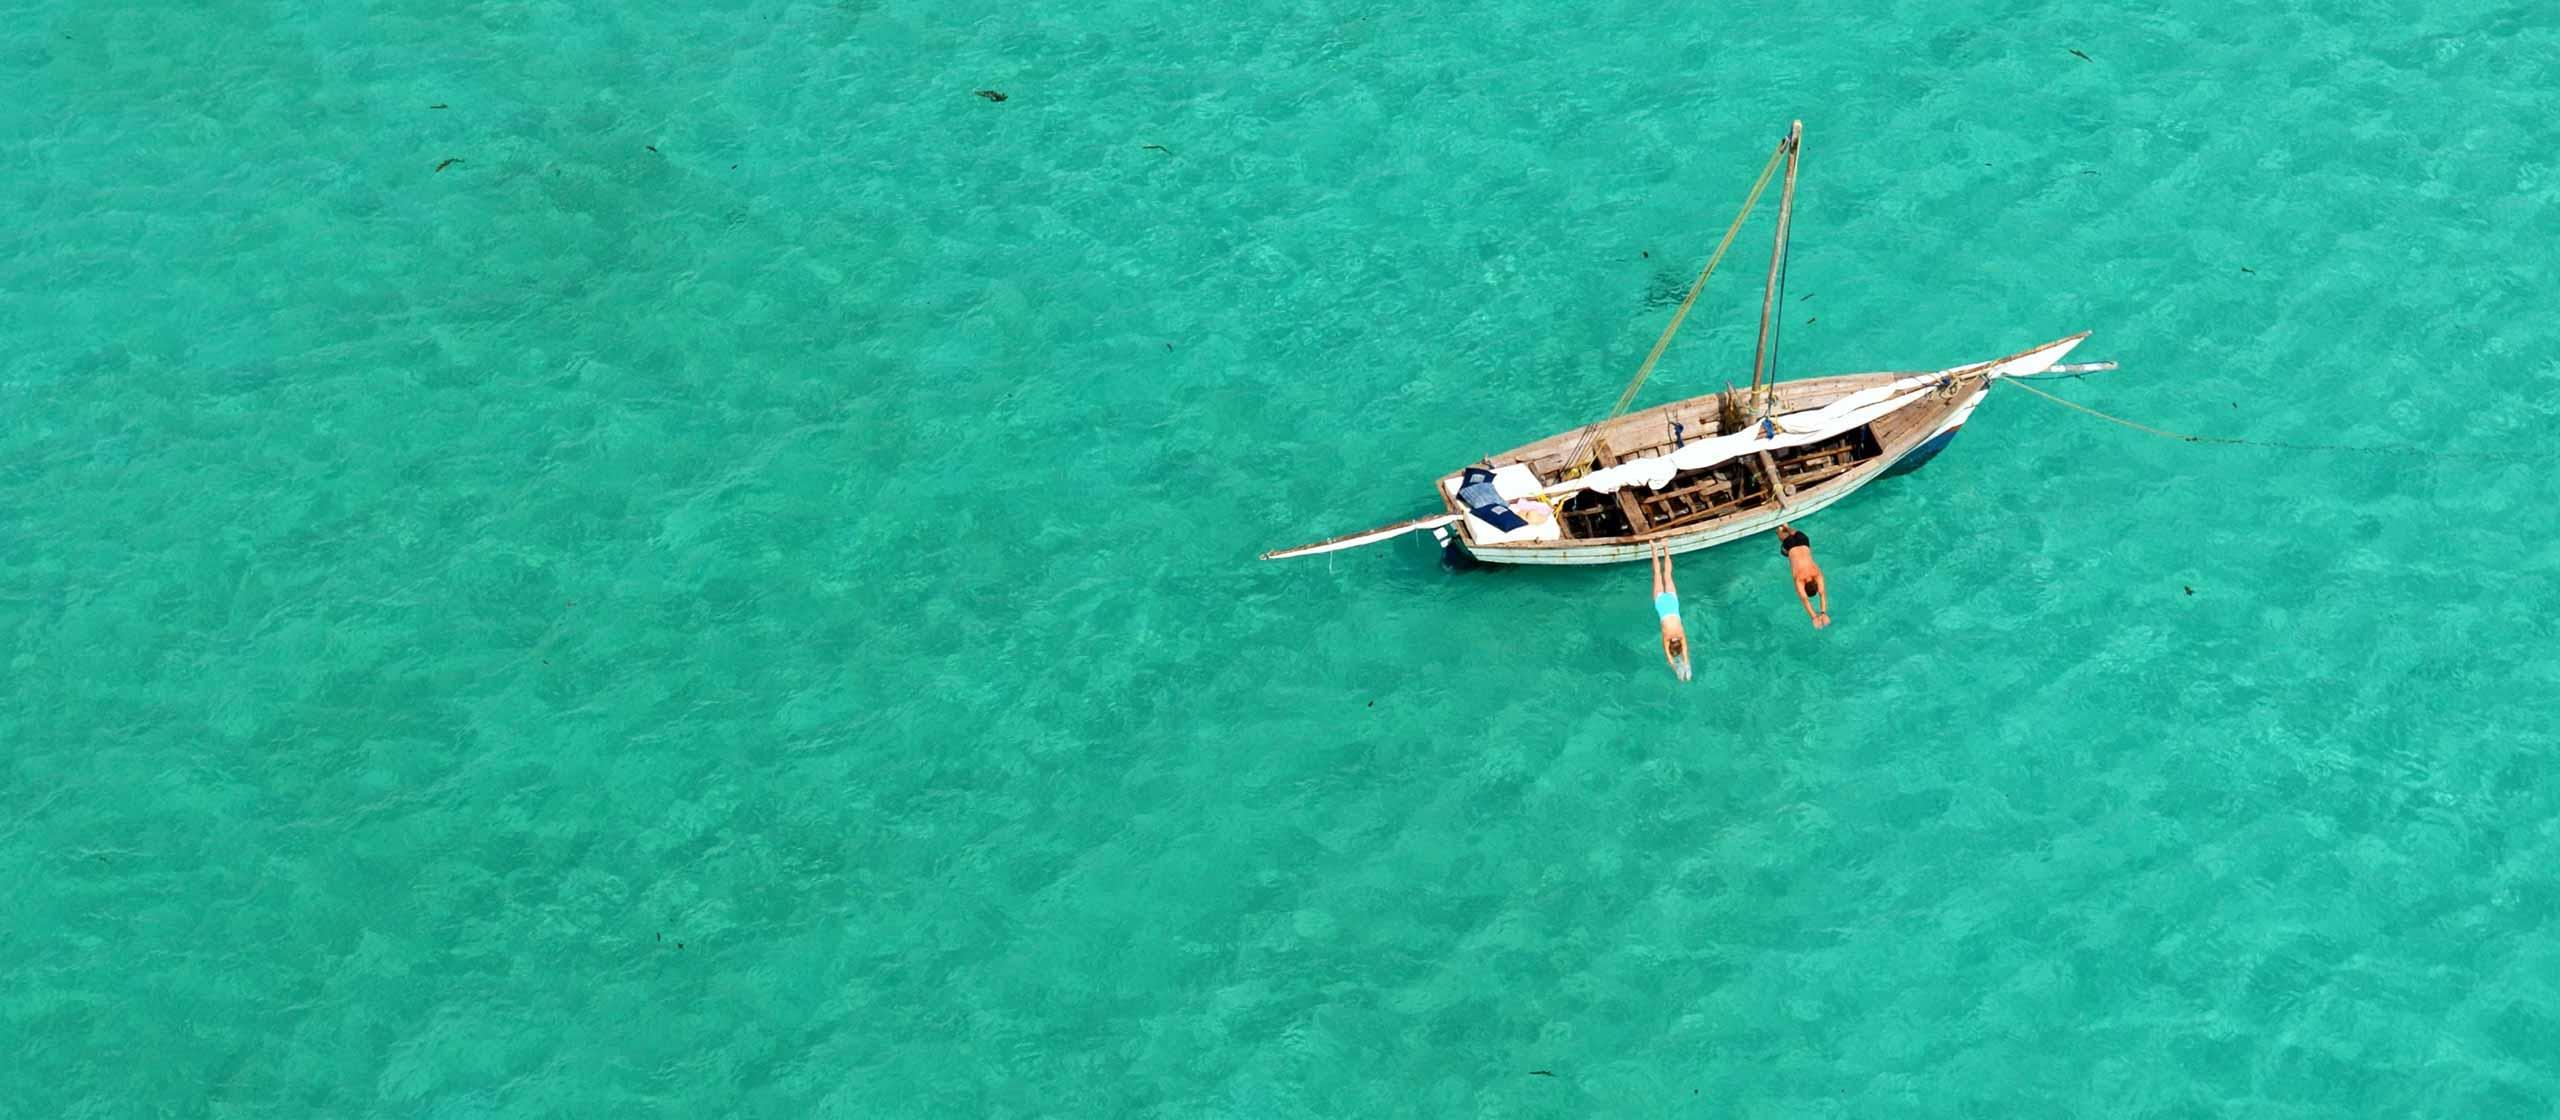 enkosi-africa-safari-mozambique-quirimbas-vamizi-island-andbeyond-snorkelling